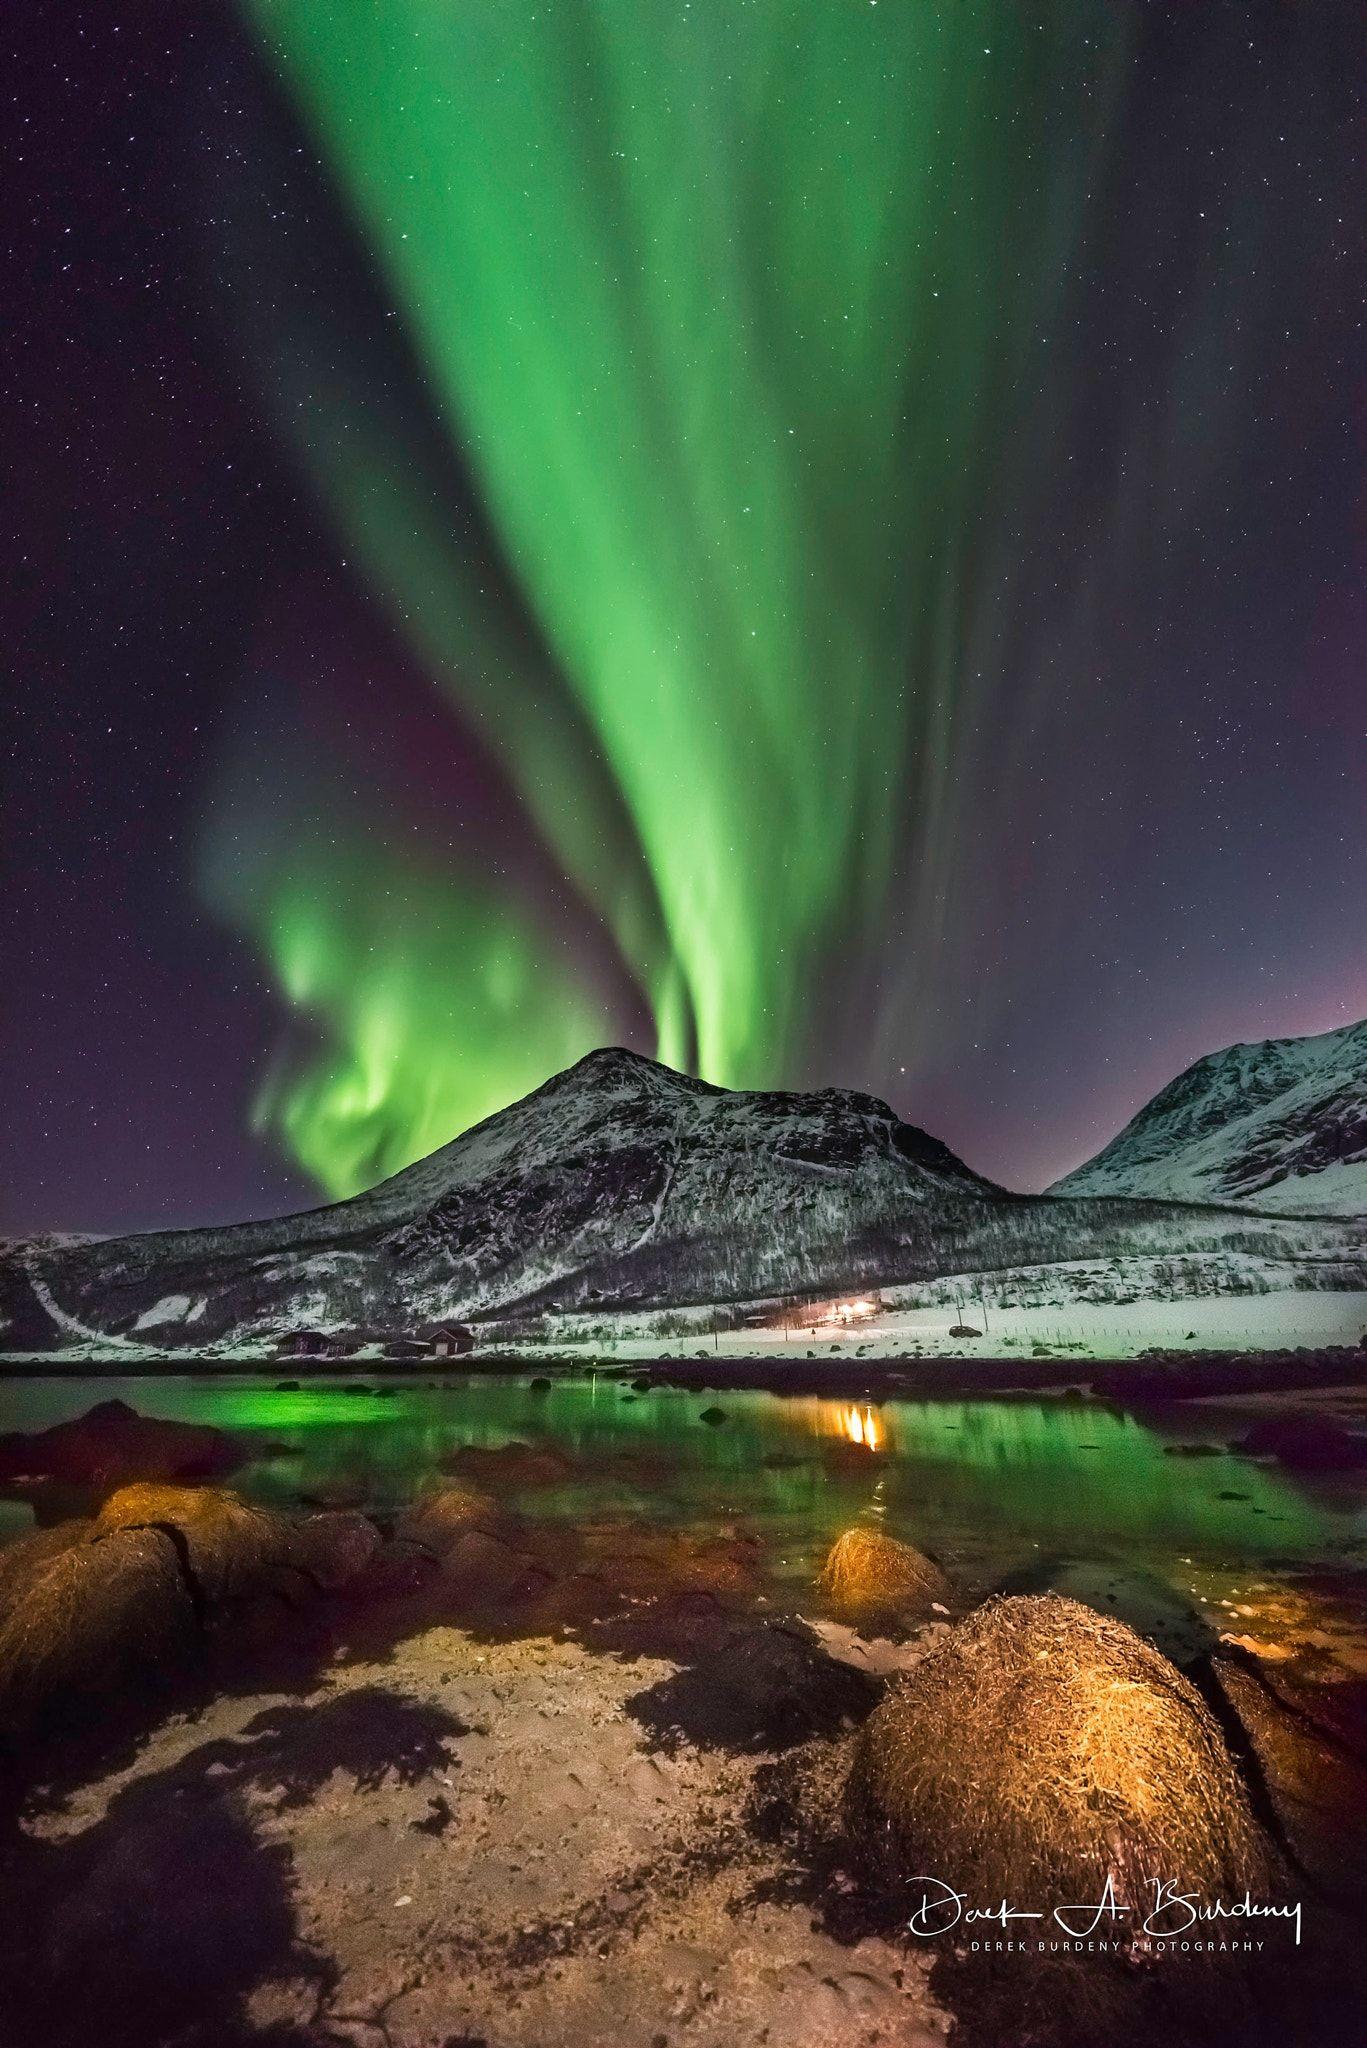 Erupting Beauty Aurora Borealis Erupts Through The Night Sky Sending Green Reflections On Arctic Pool Naturaleza Paisajes Natural